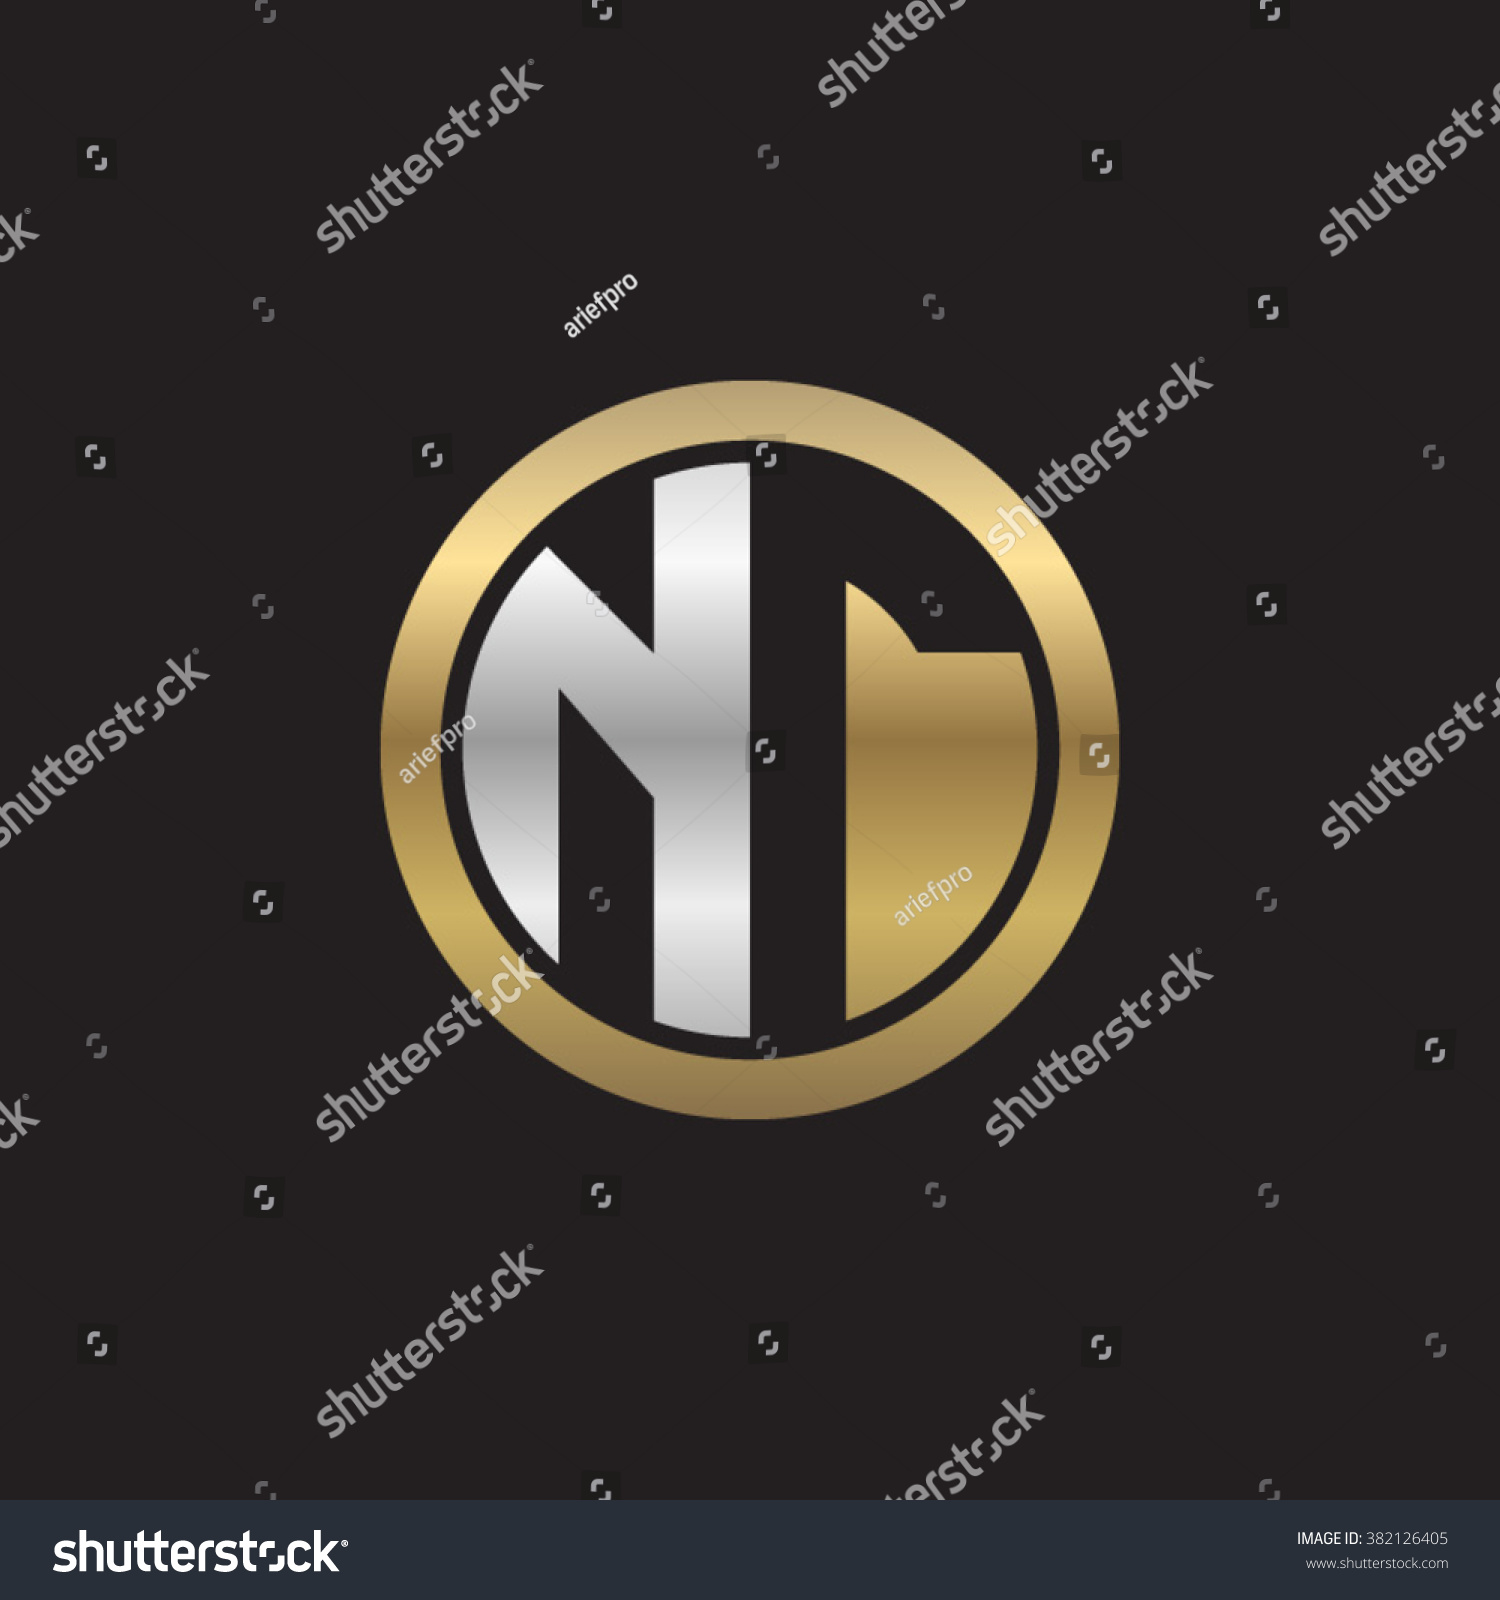 Nt Initial Letters Circle Elegant Logo Stock Vector Royalty Free